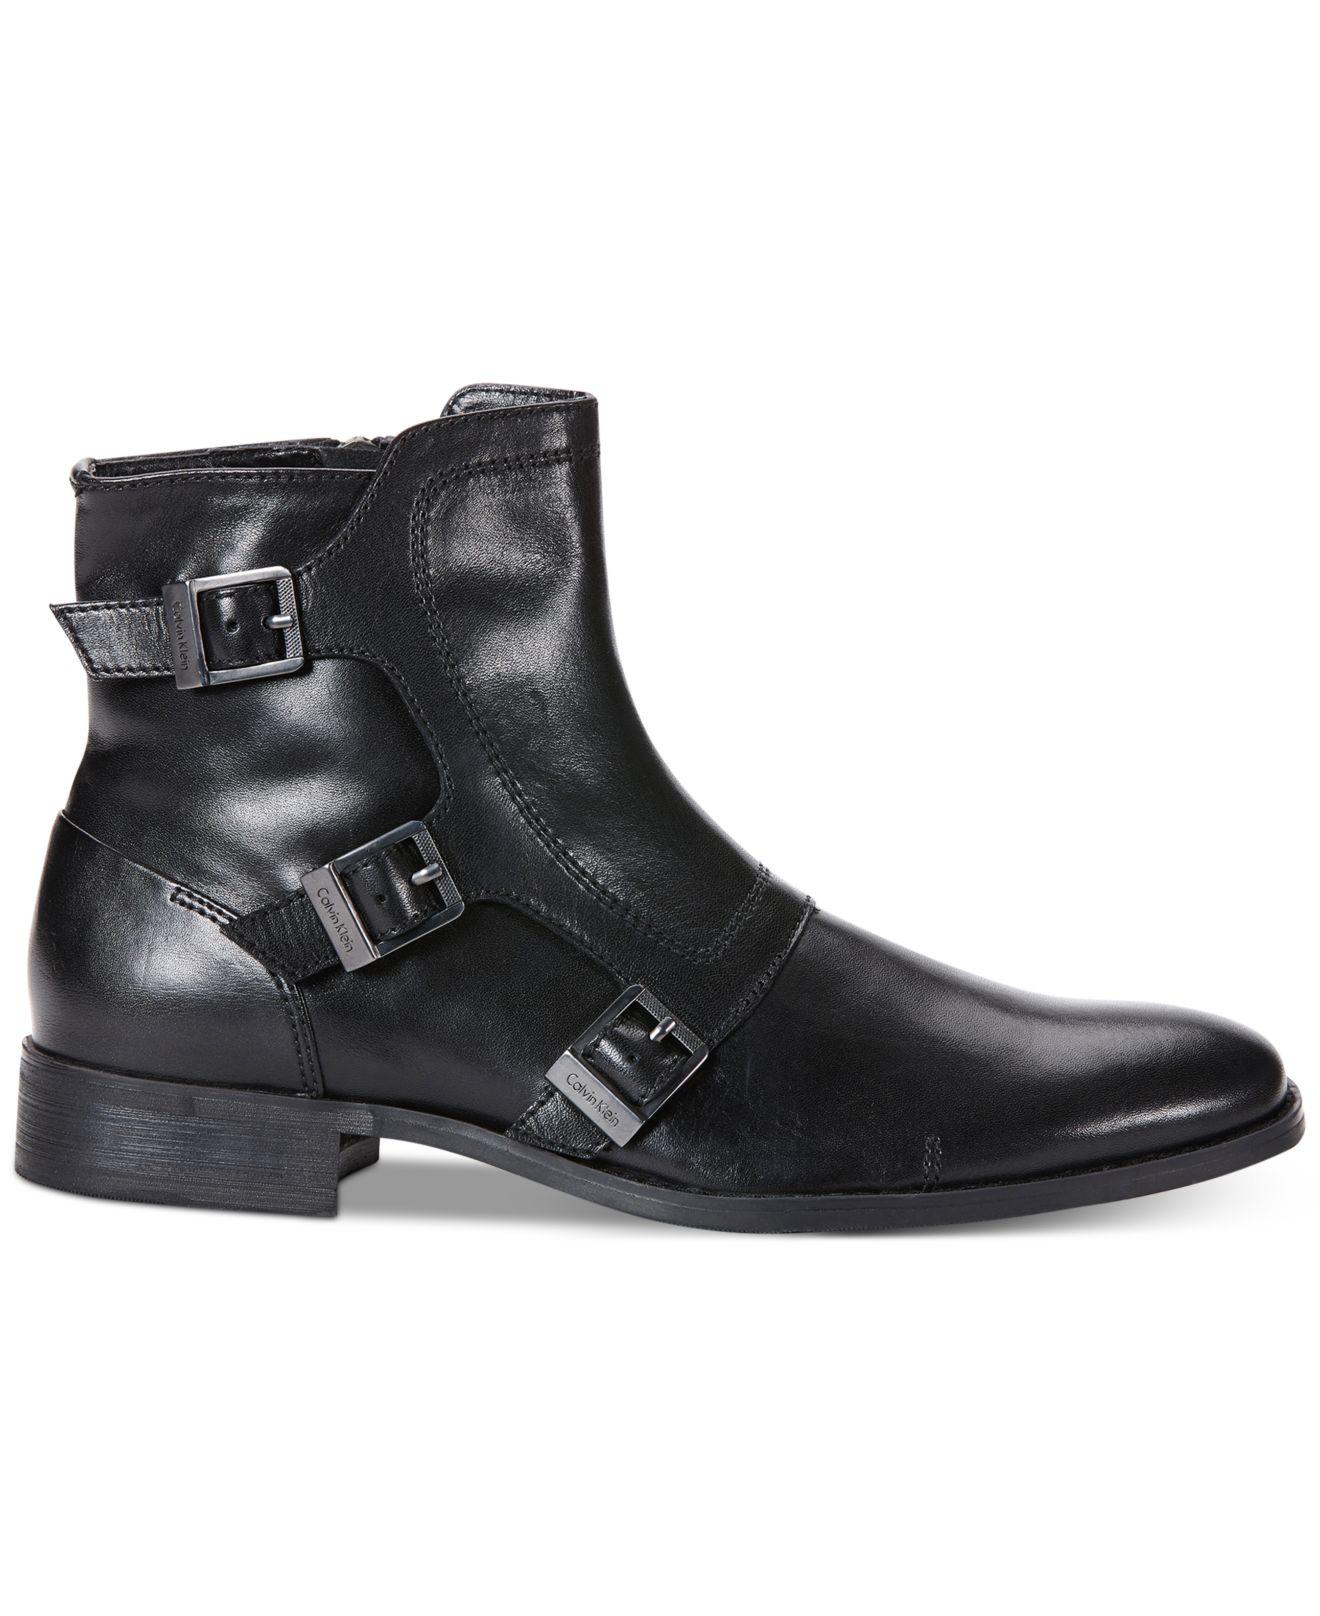 Mens Boots Calvin Klein Stark Black Leather